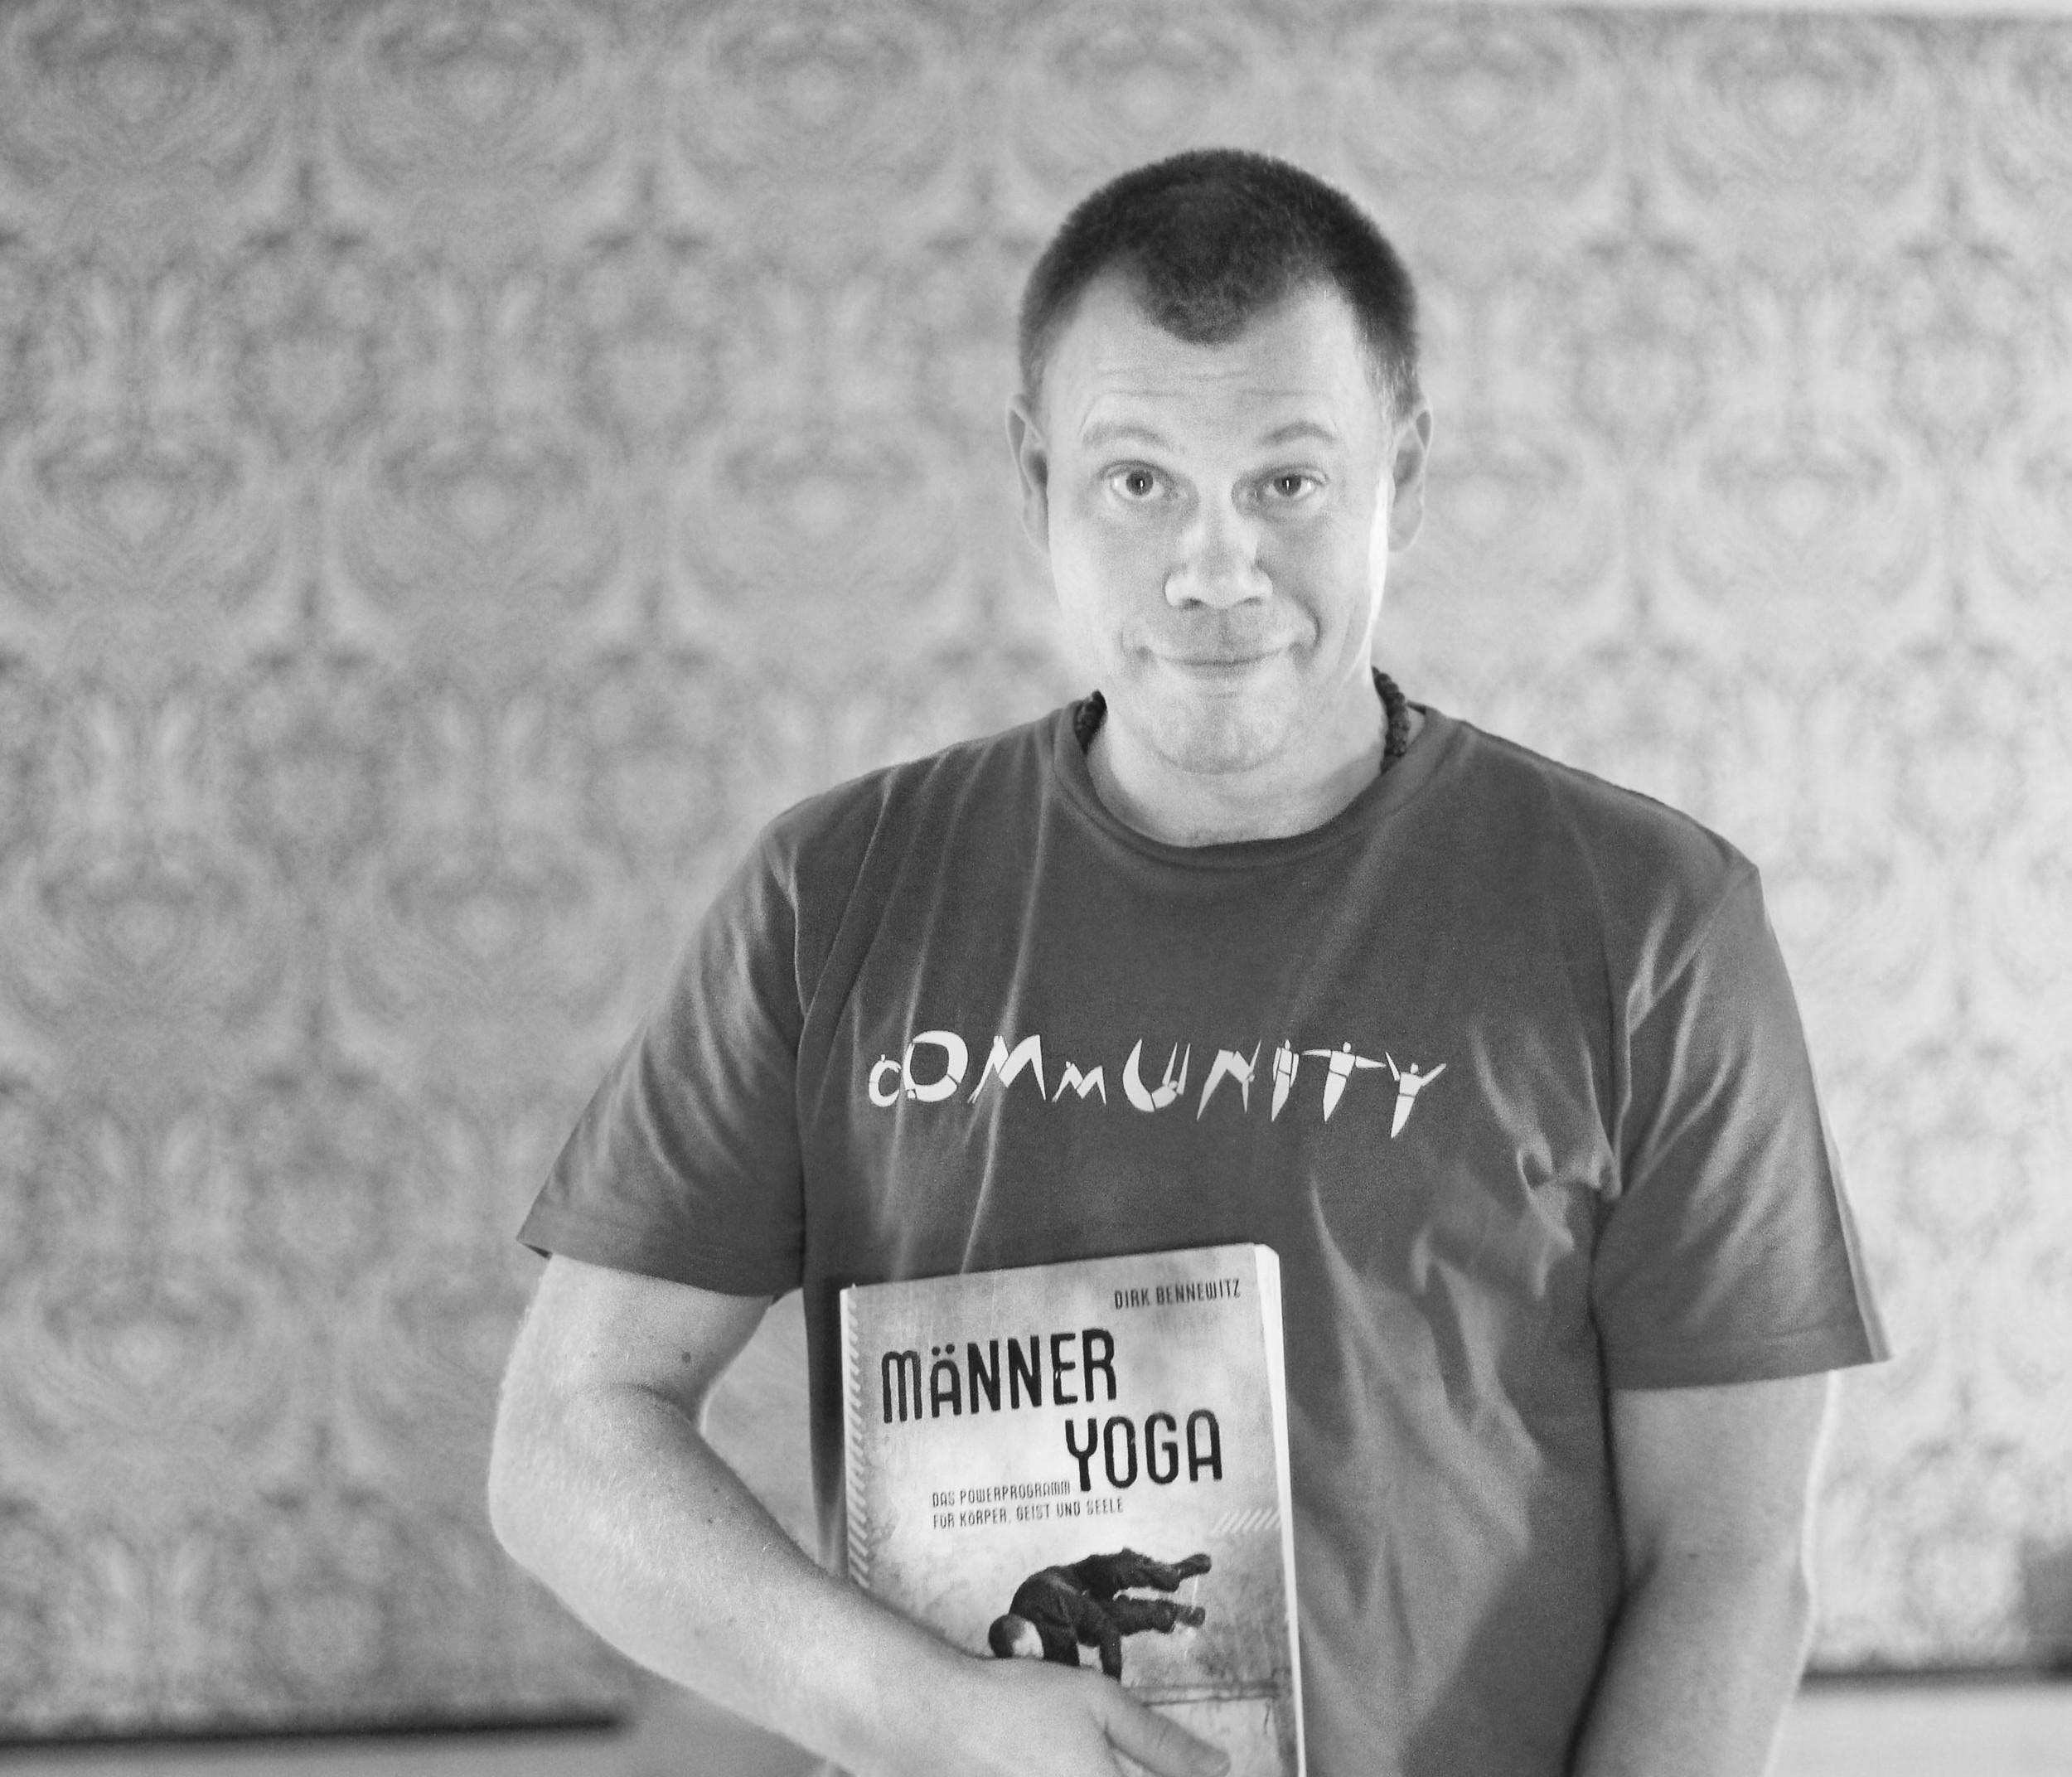 Dirk Bennewitz Männer Yoga Hamburg633.jpg